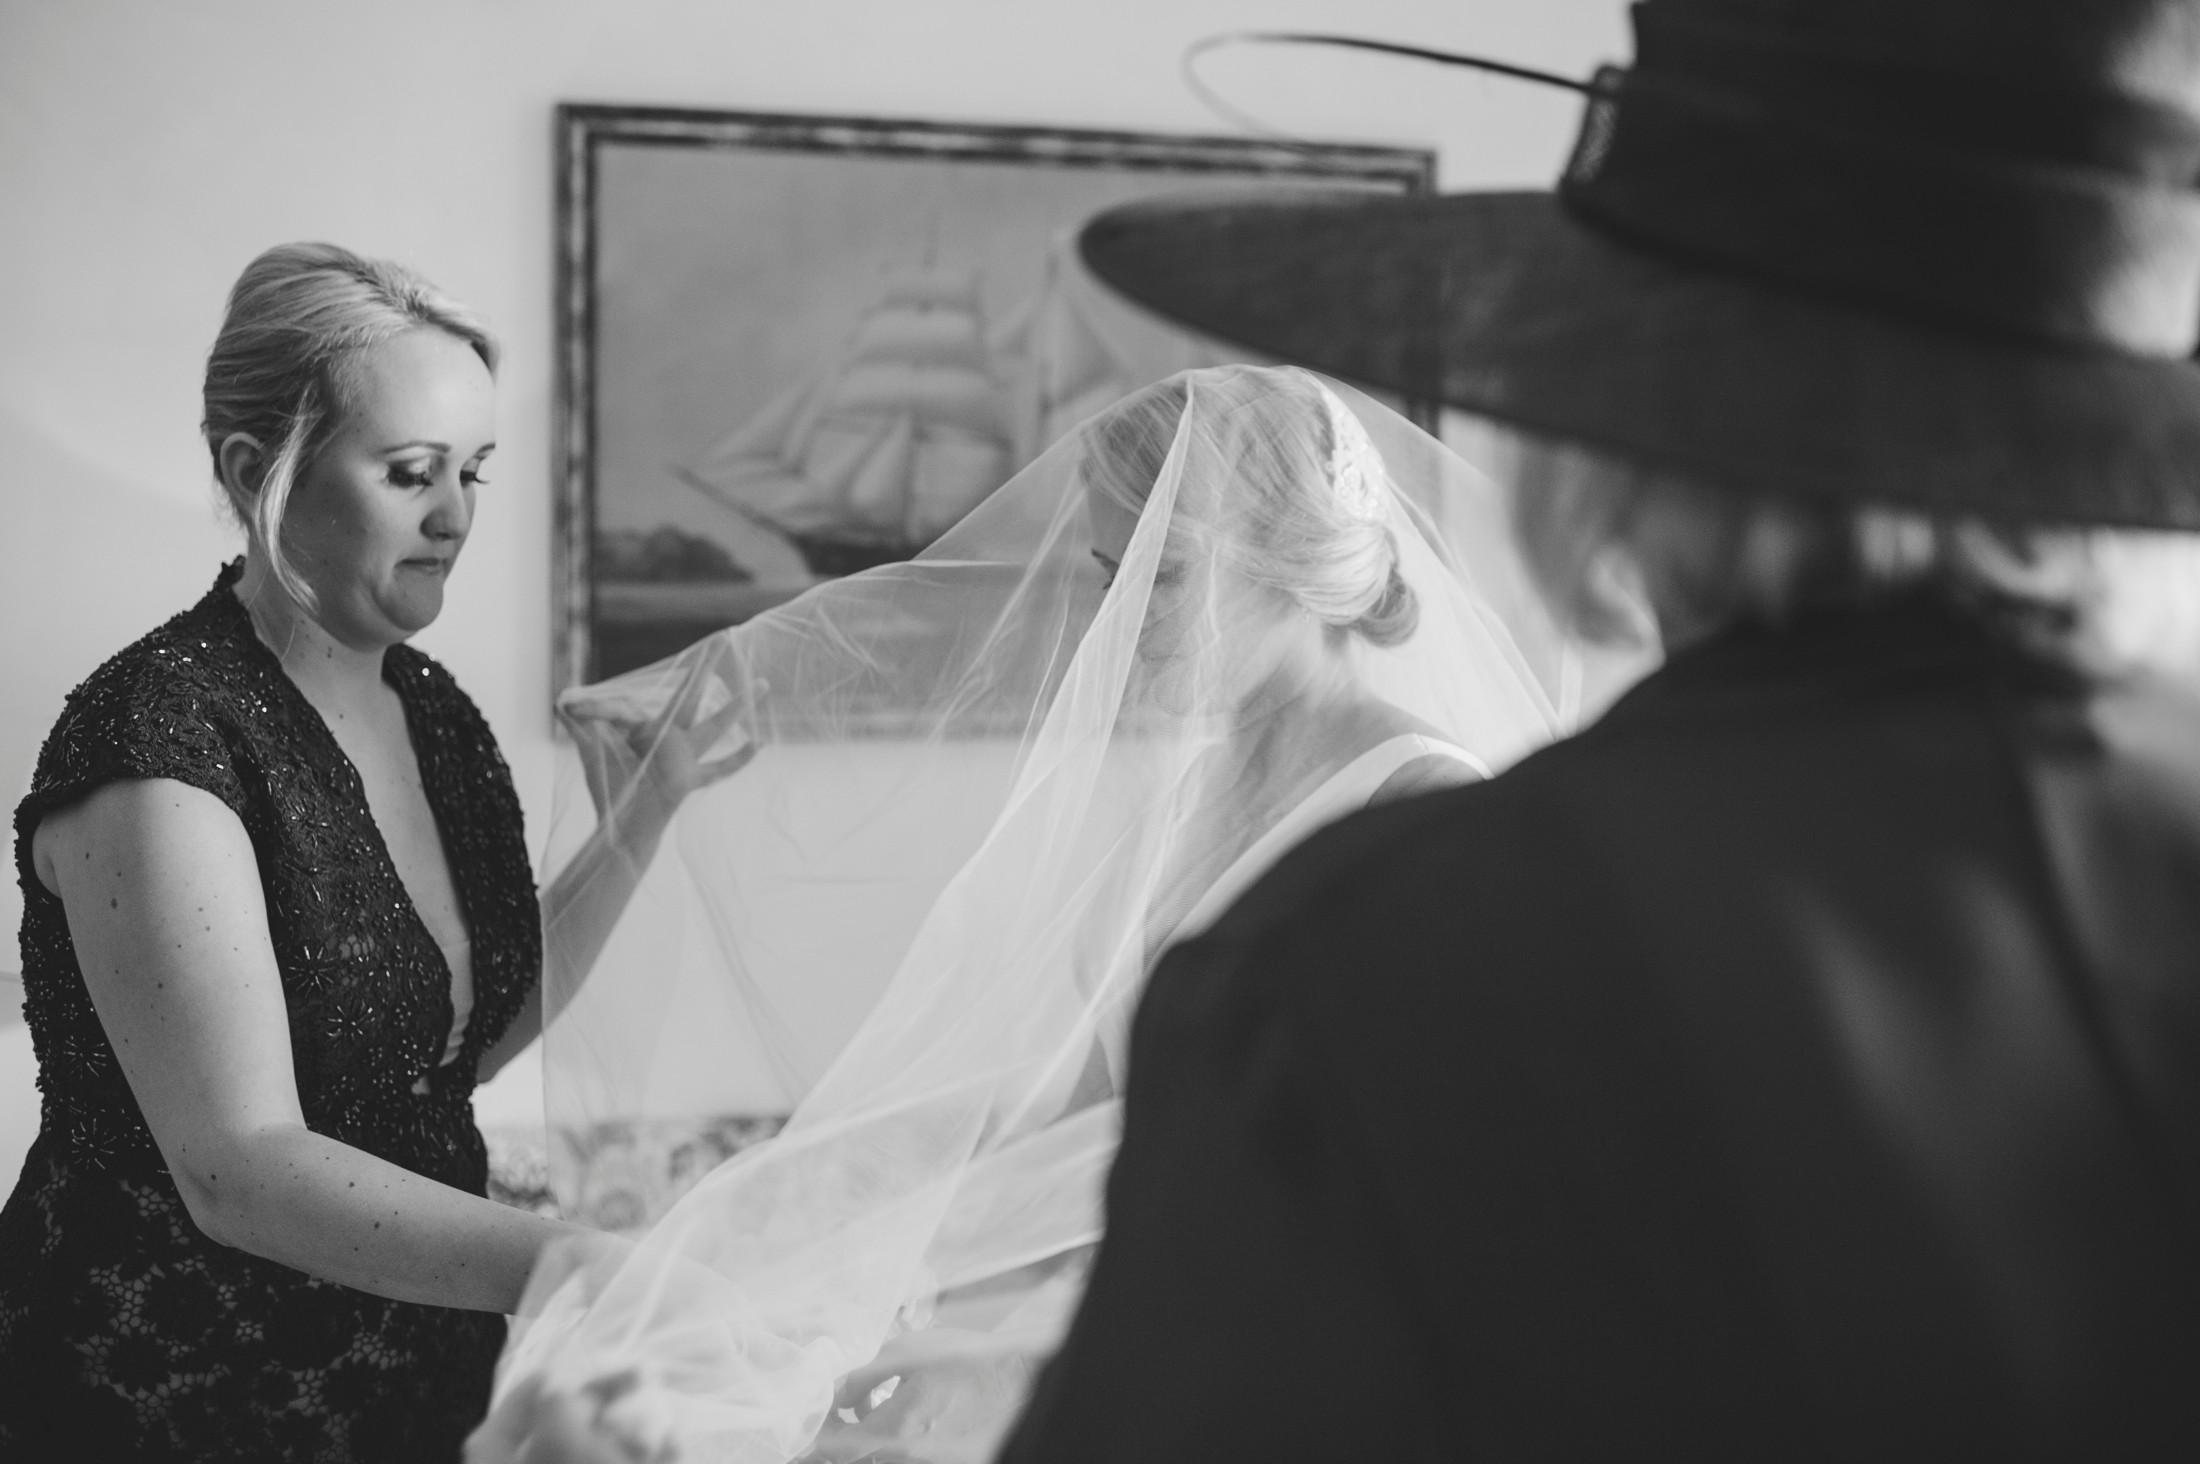 the bride wears her wedding veil